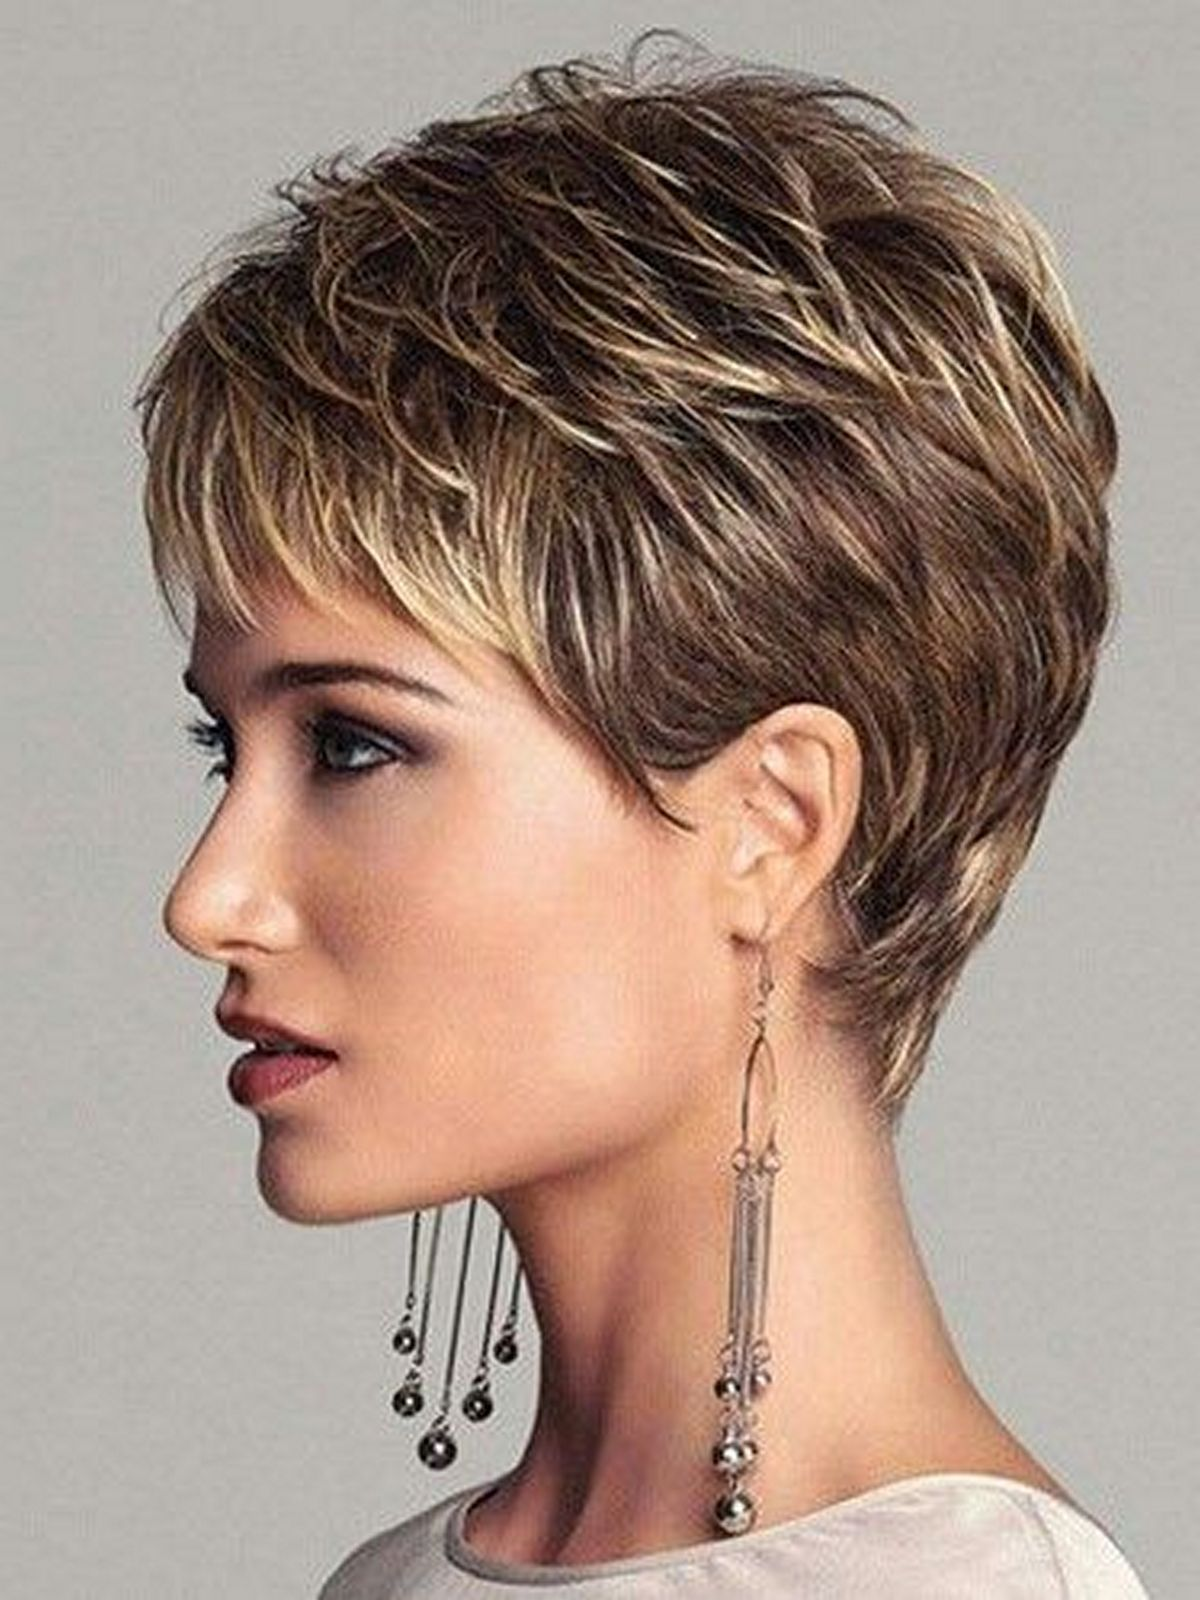 Pixie Haircuts For Women 53 Hair Styles Pinterest Pixie